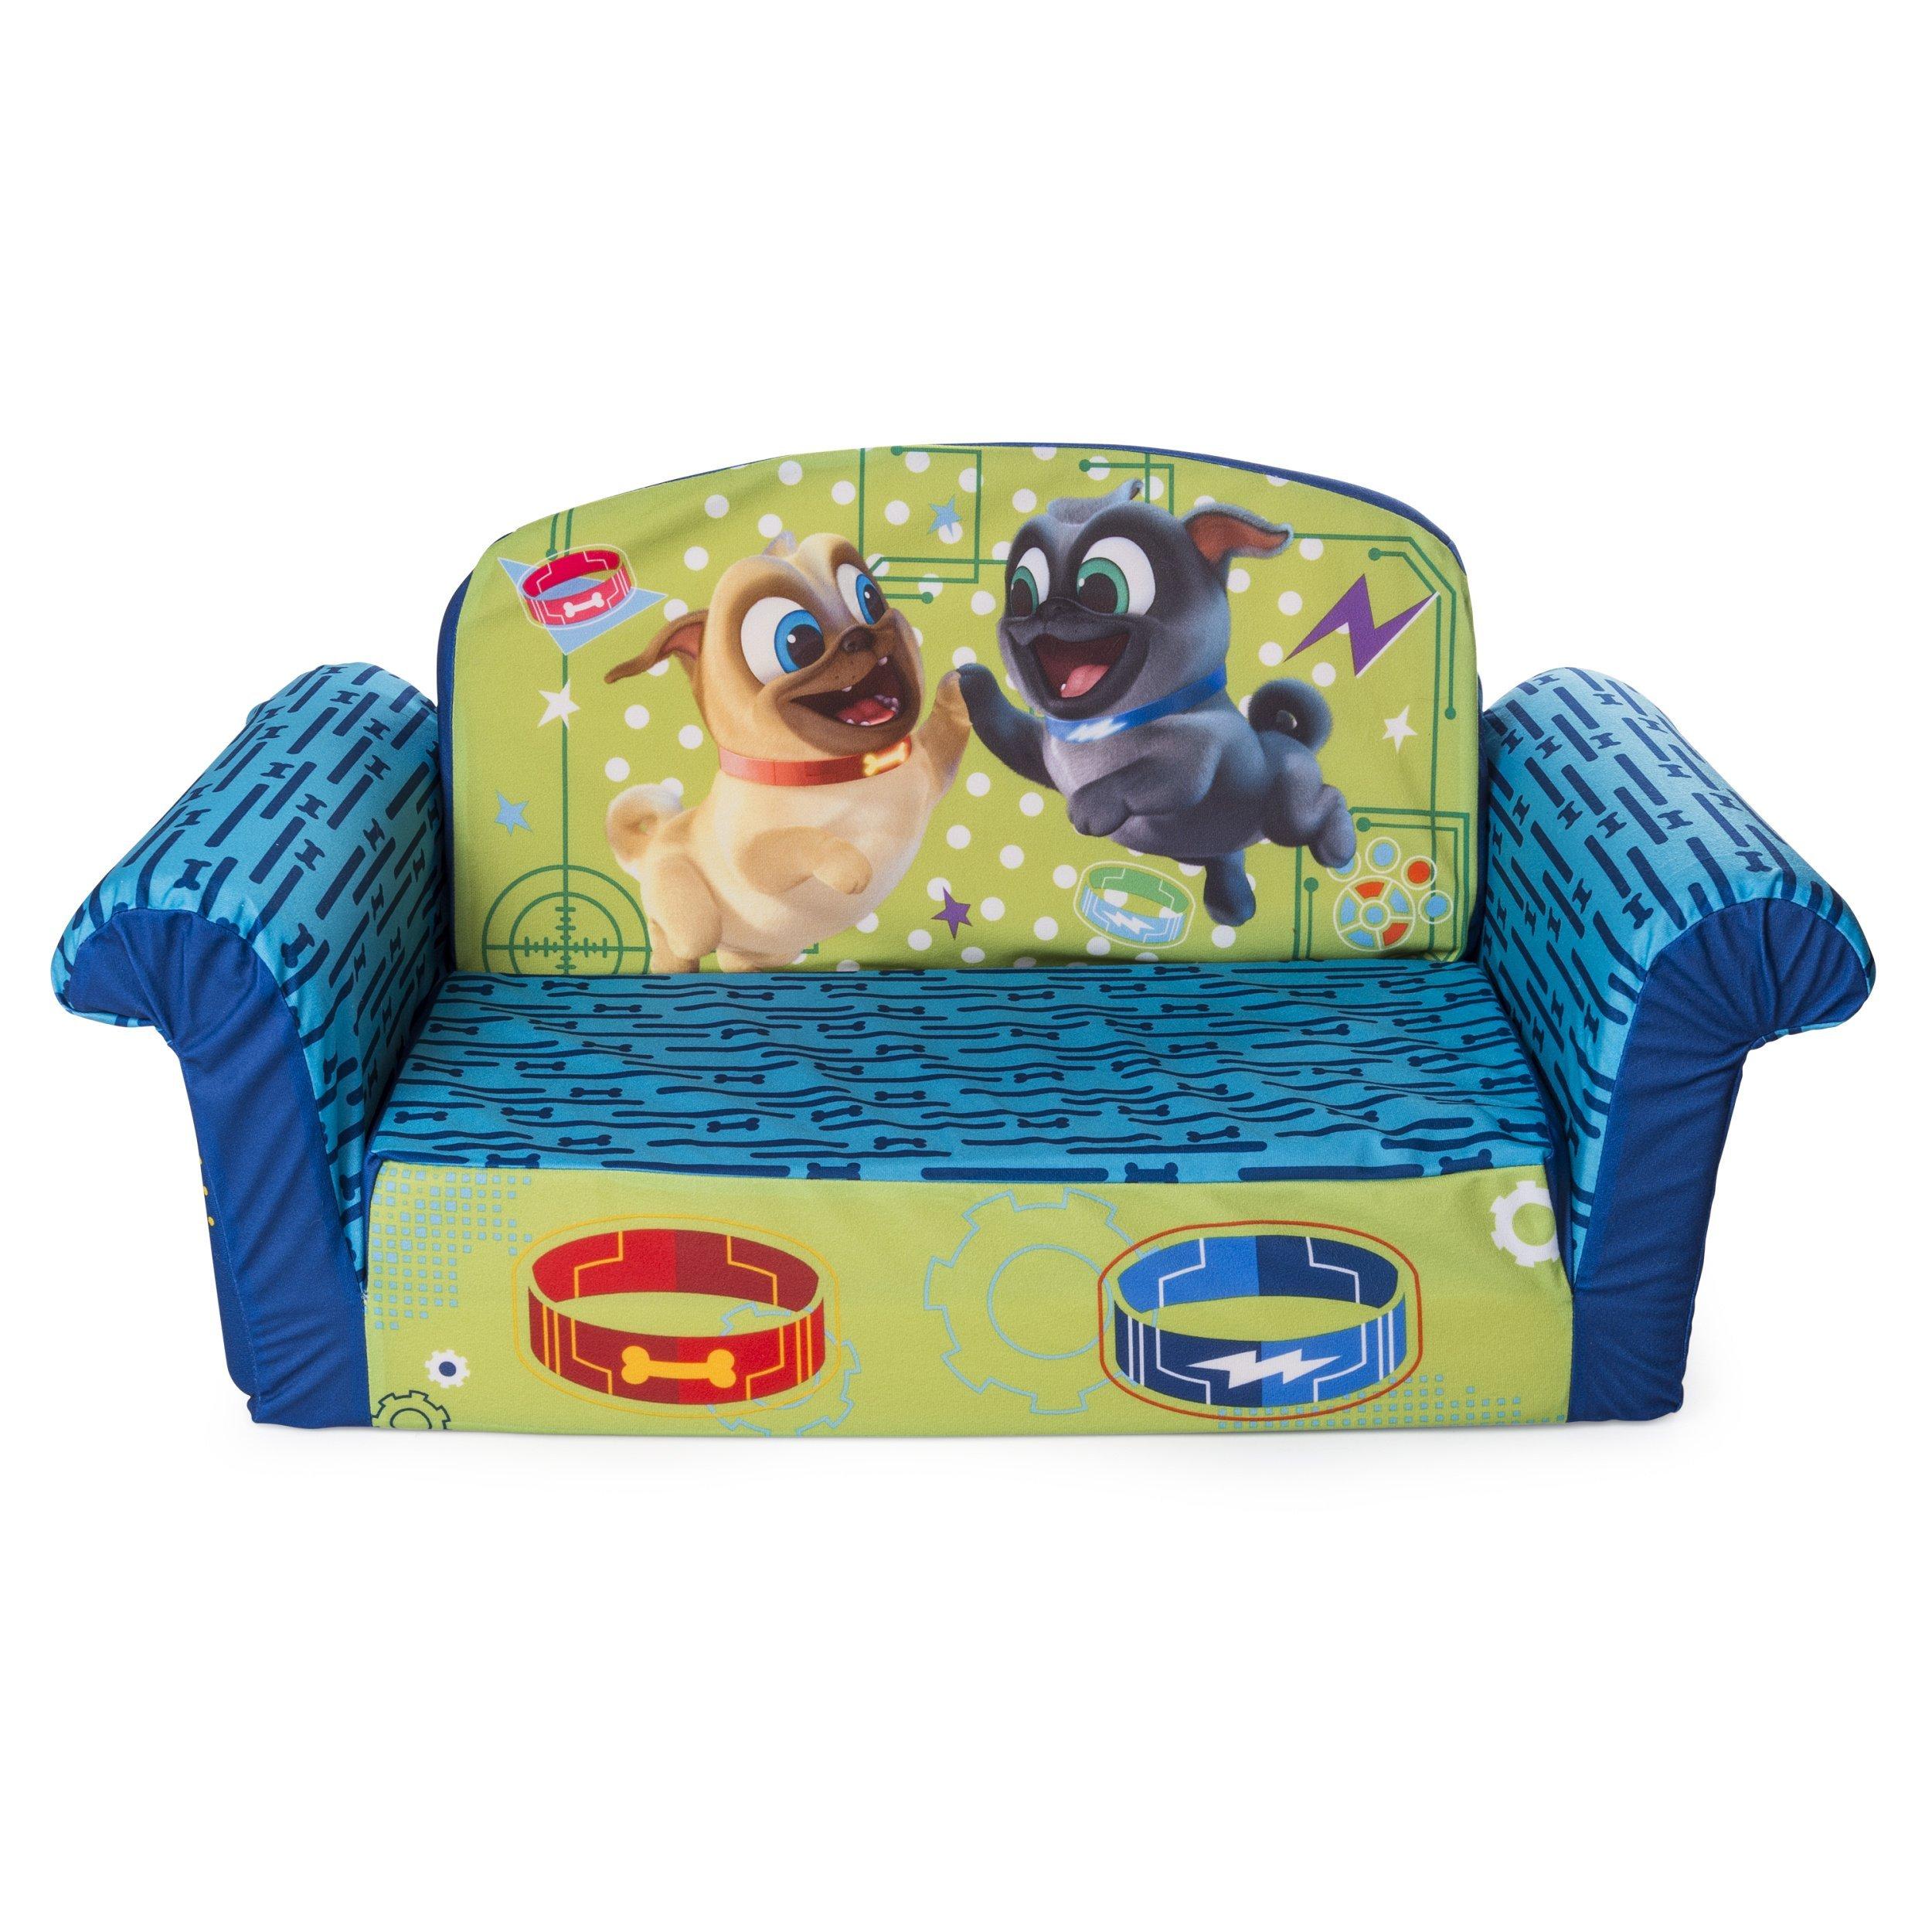 Marshmallow Furniture, Children's 2 in 1 Flip Open Foam Sofa, Disney's Puppy Dog Pals by Spin Master